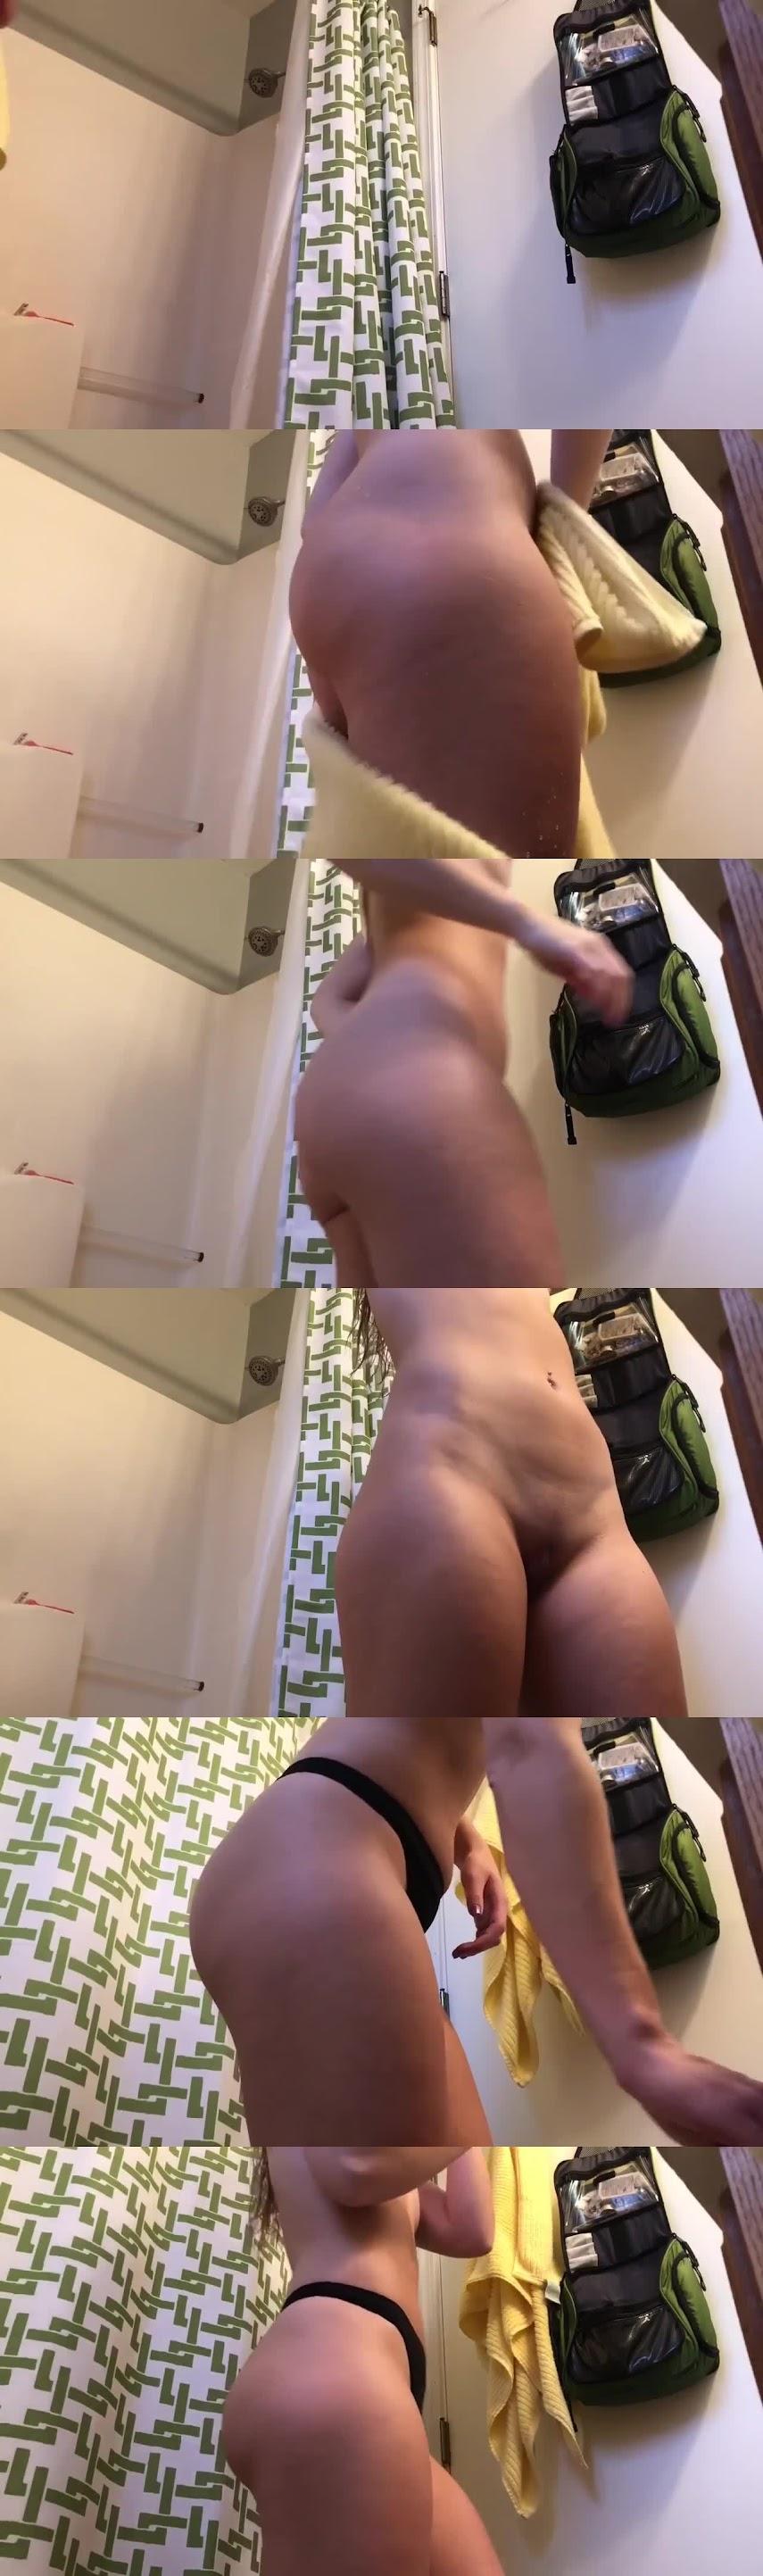 Voyeur hz 28775 sexy girls image jav